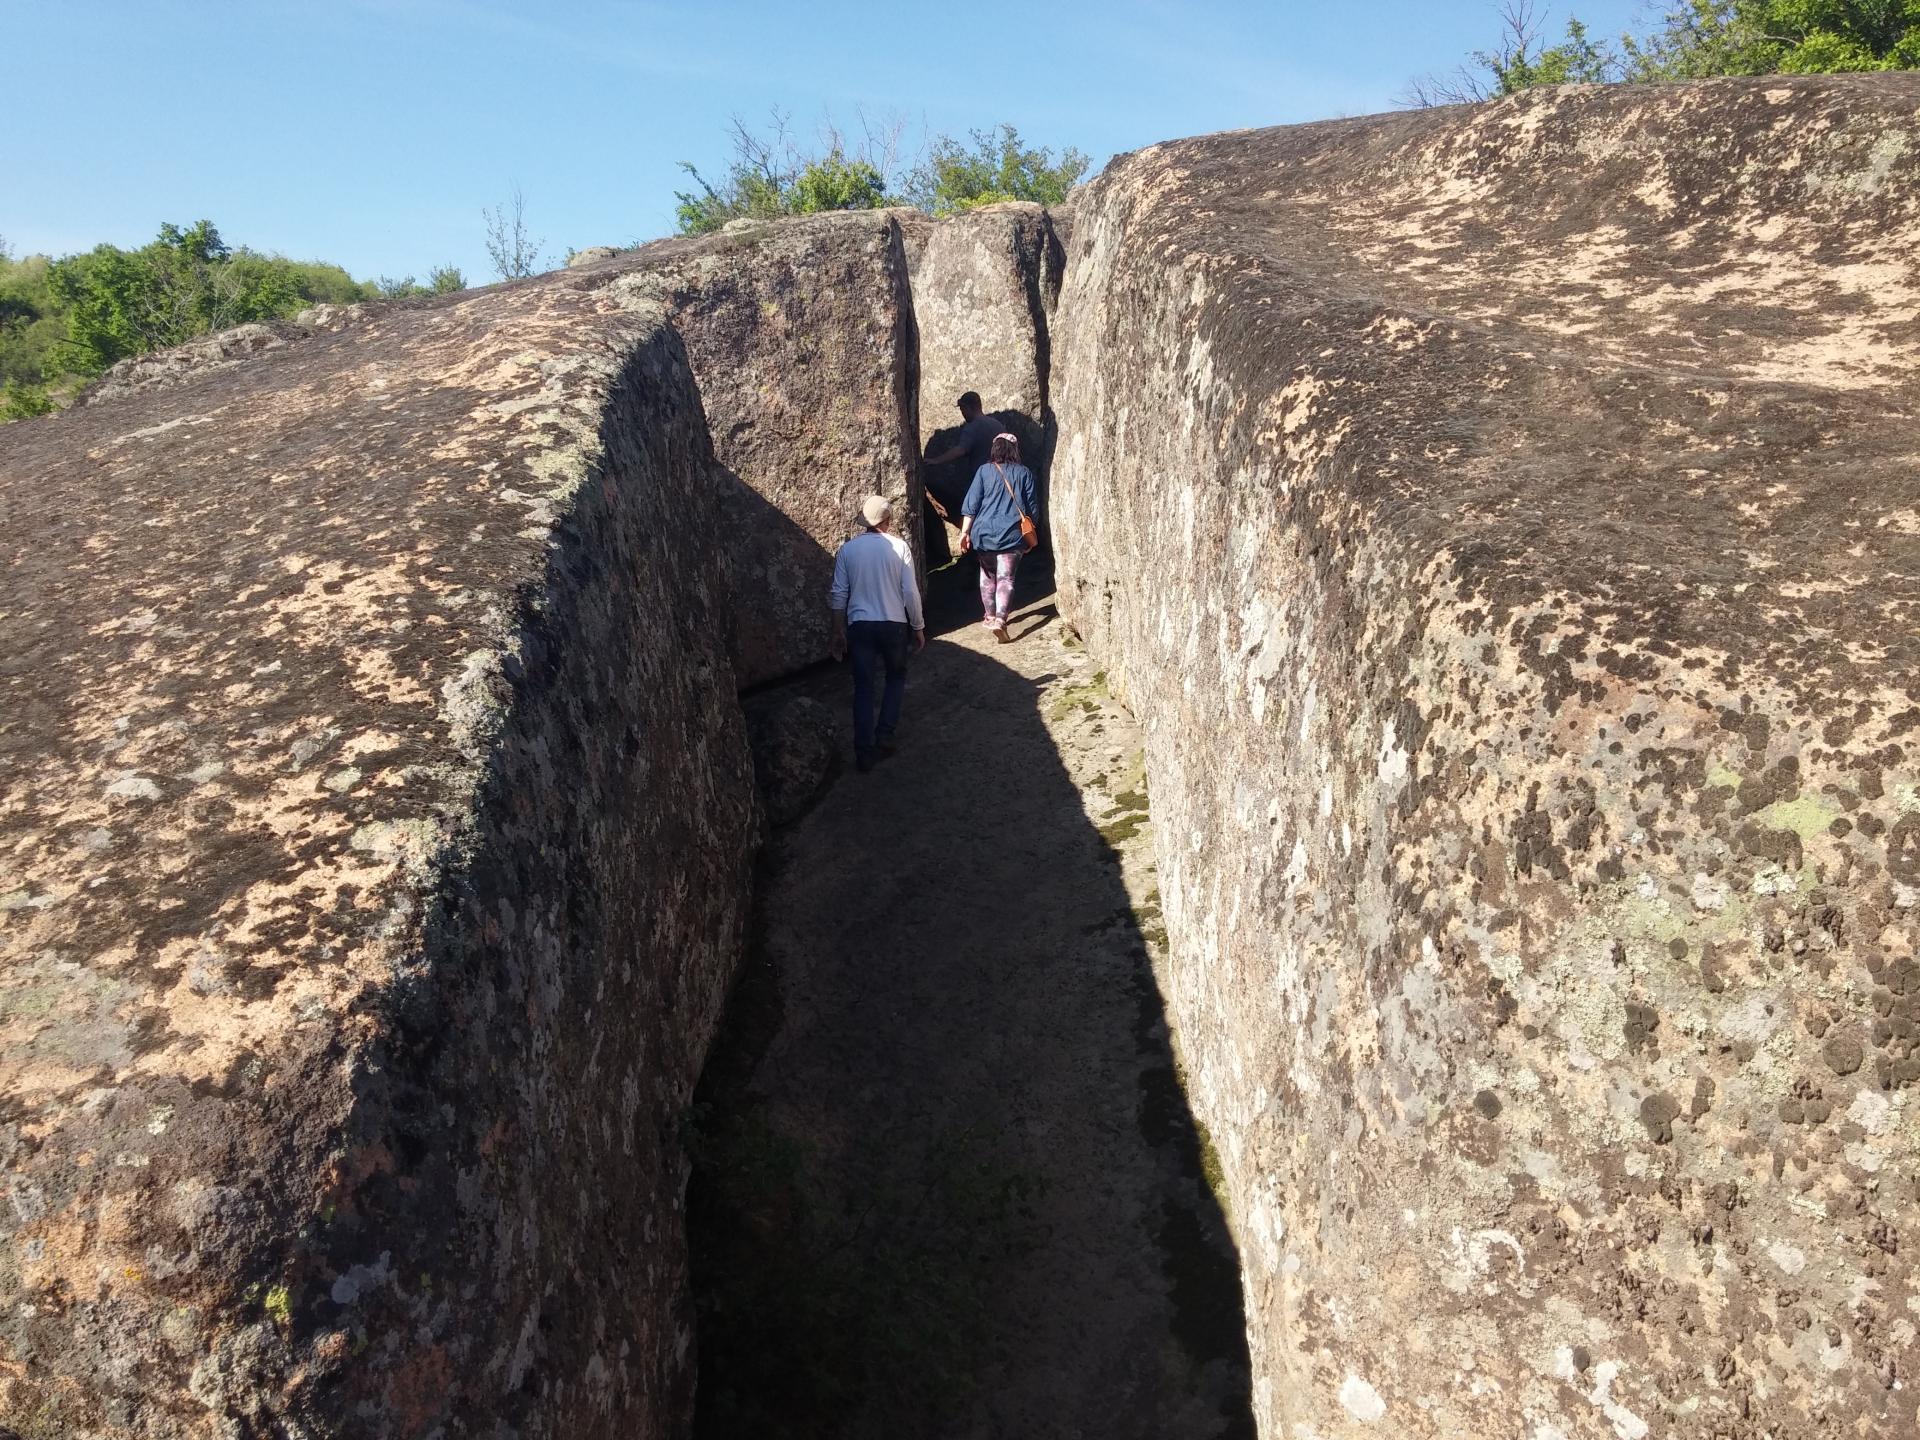 арбузинский каньон лабиринт